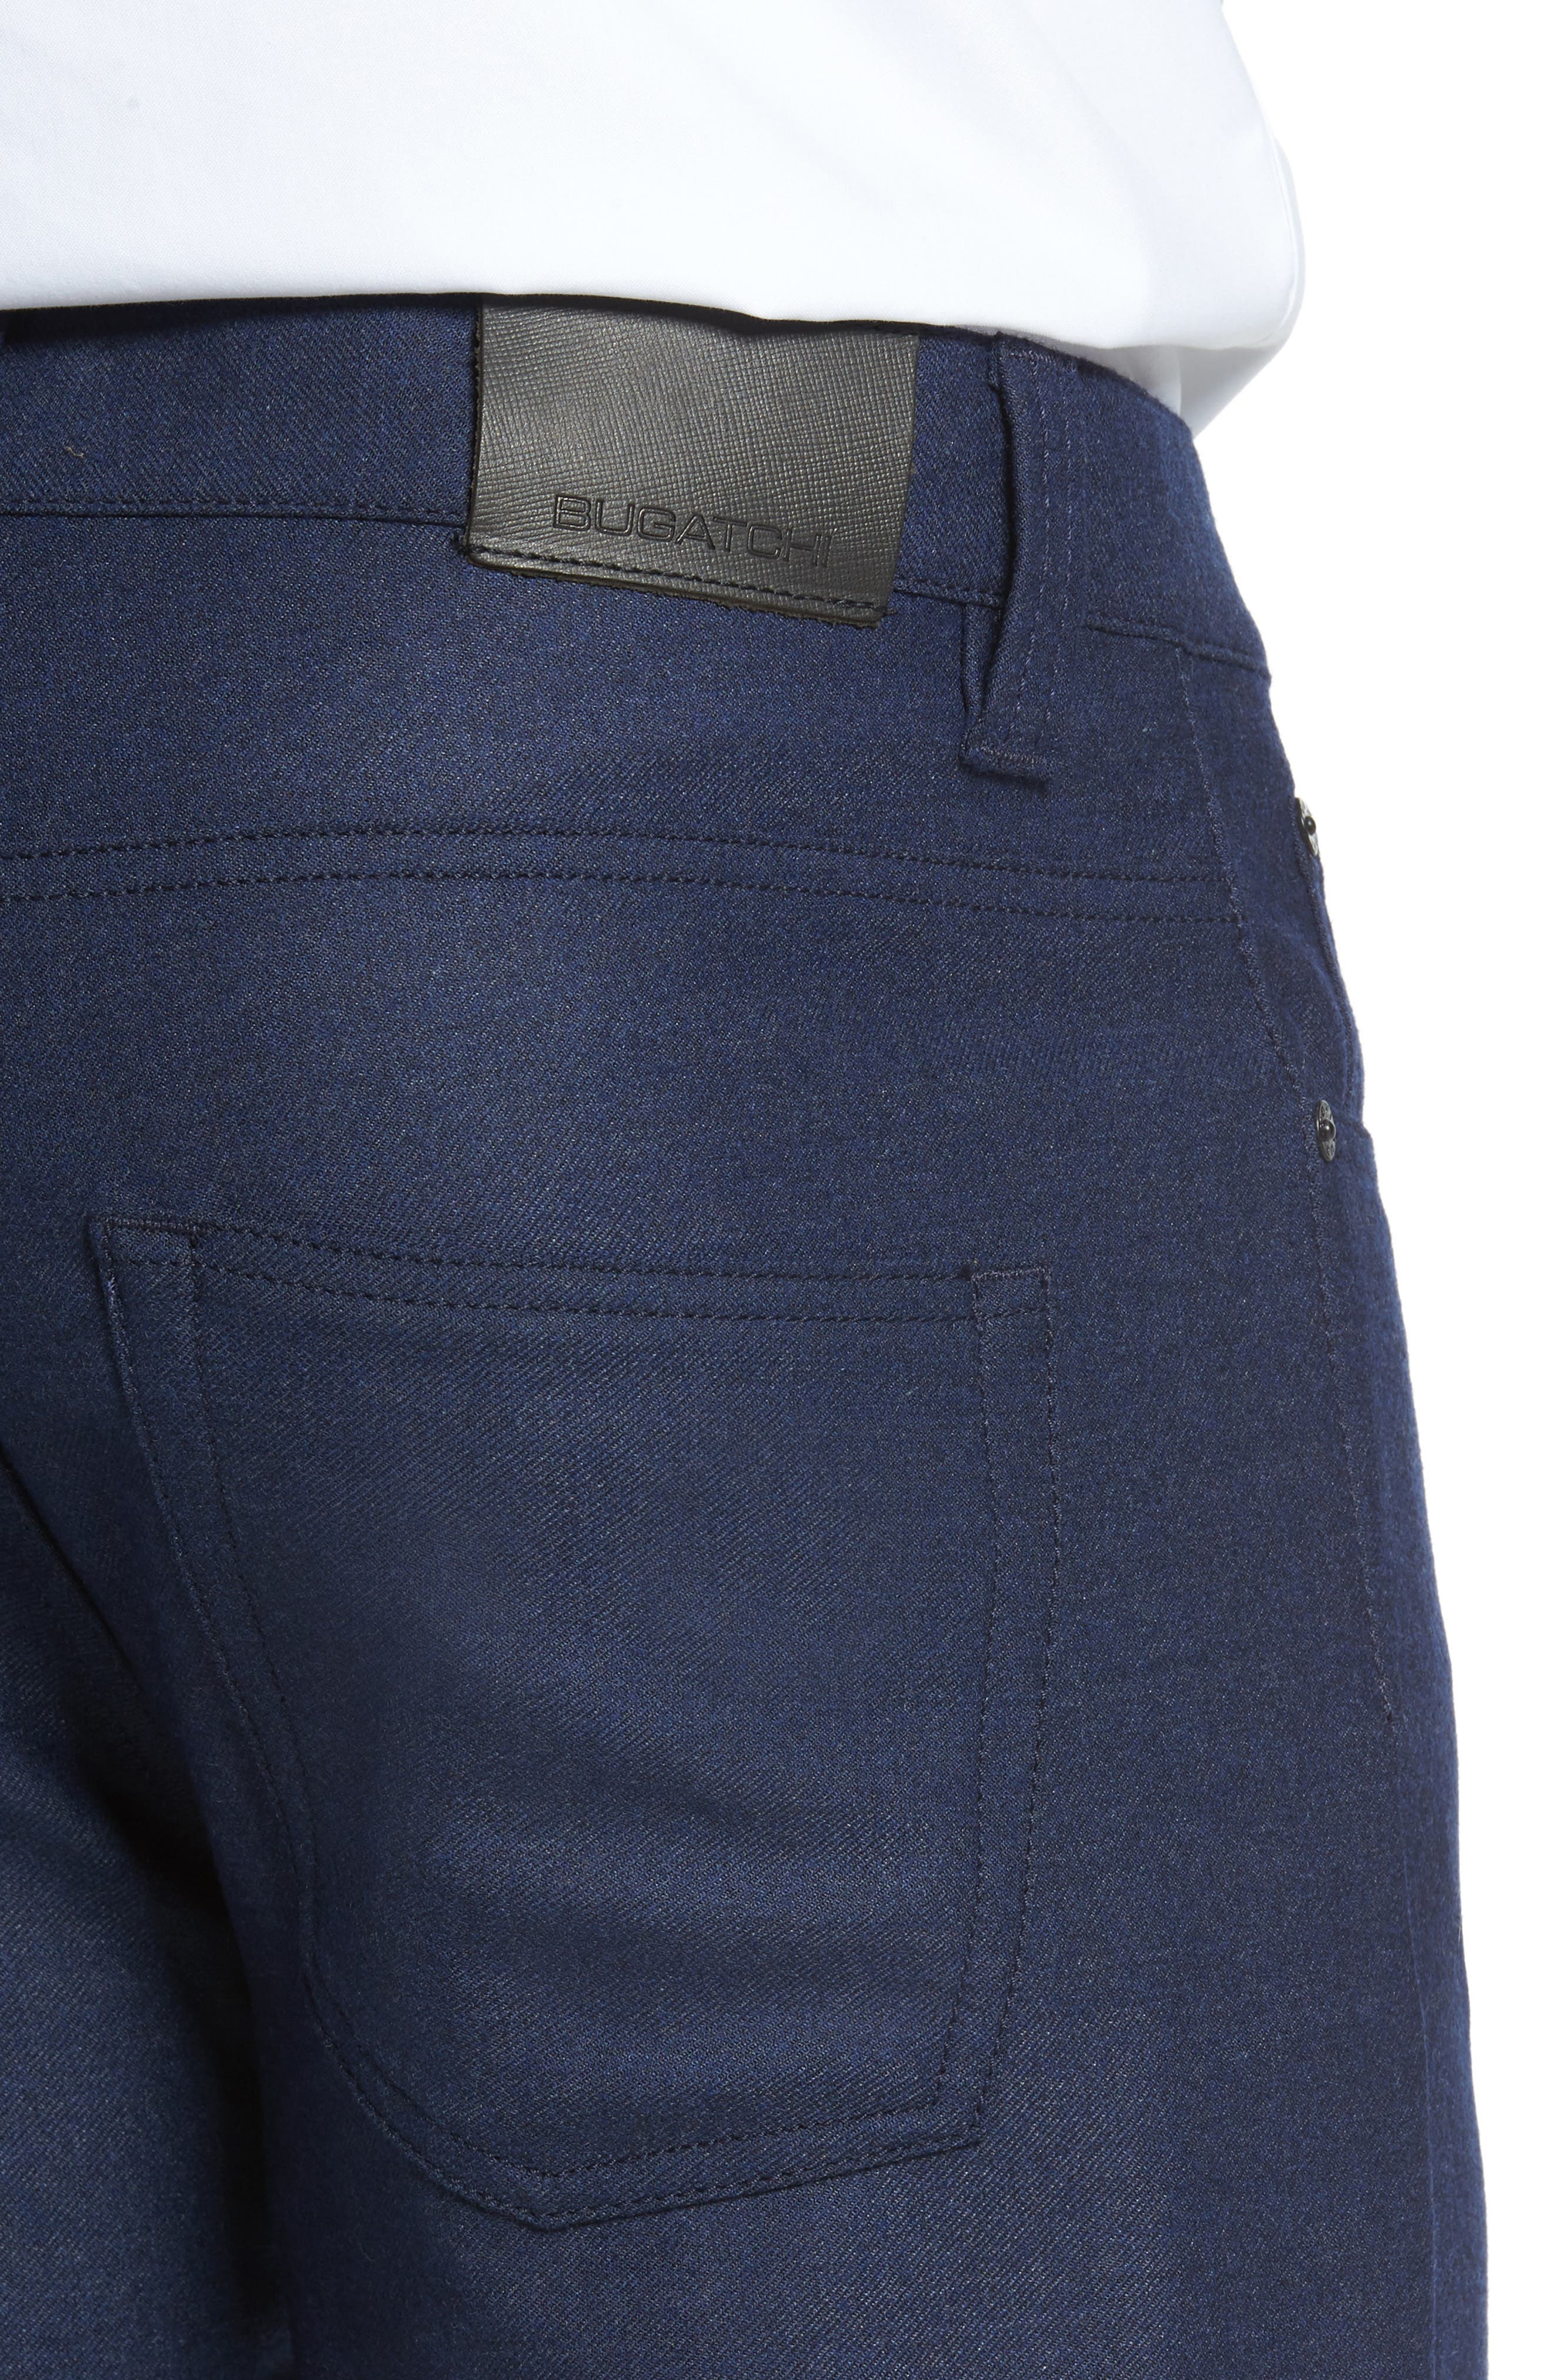 Wool Blend Pants,                             Alternate thumbnail 4, color,                             Navy